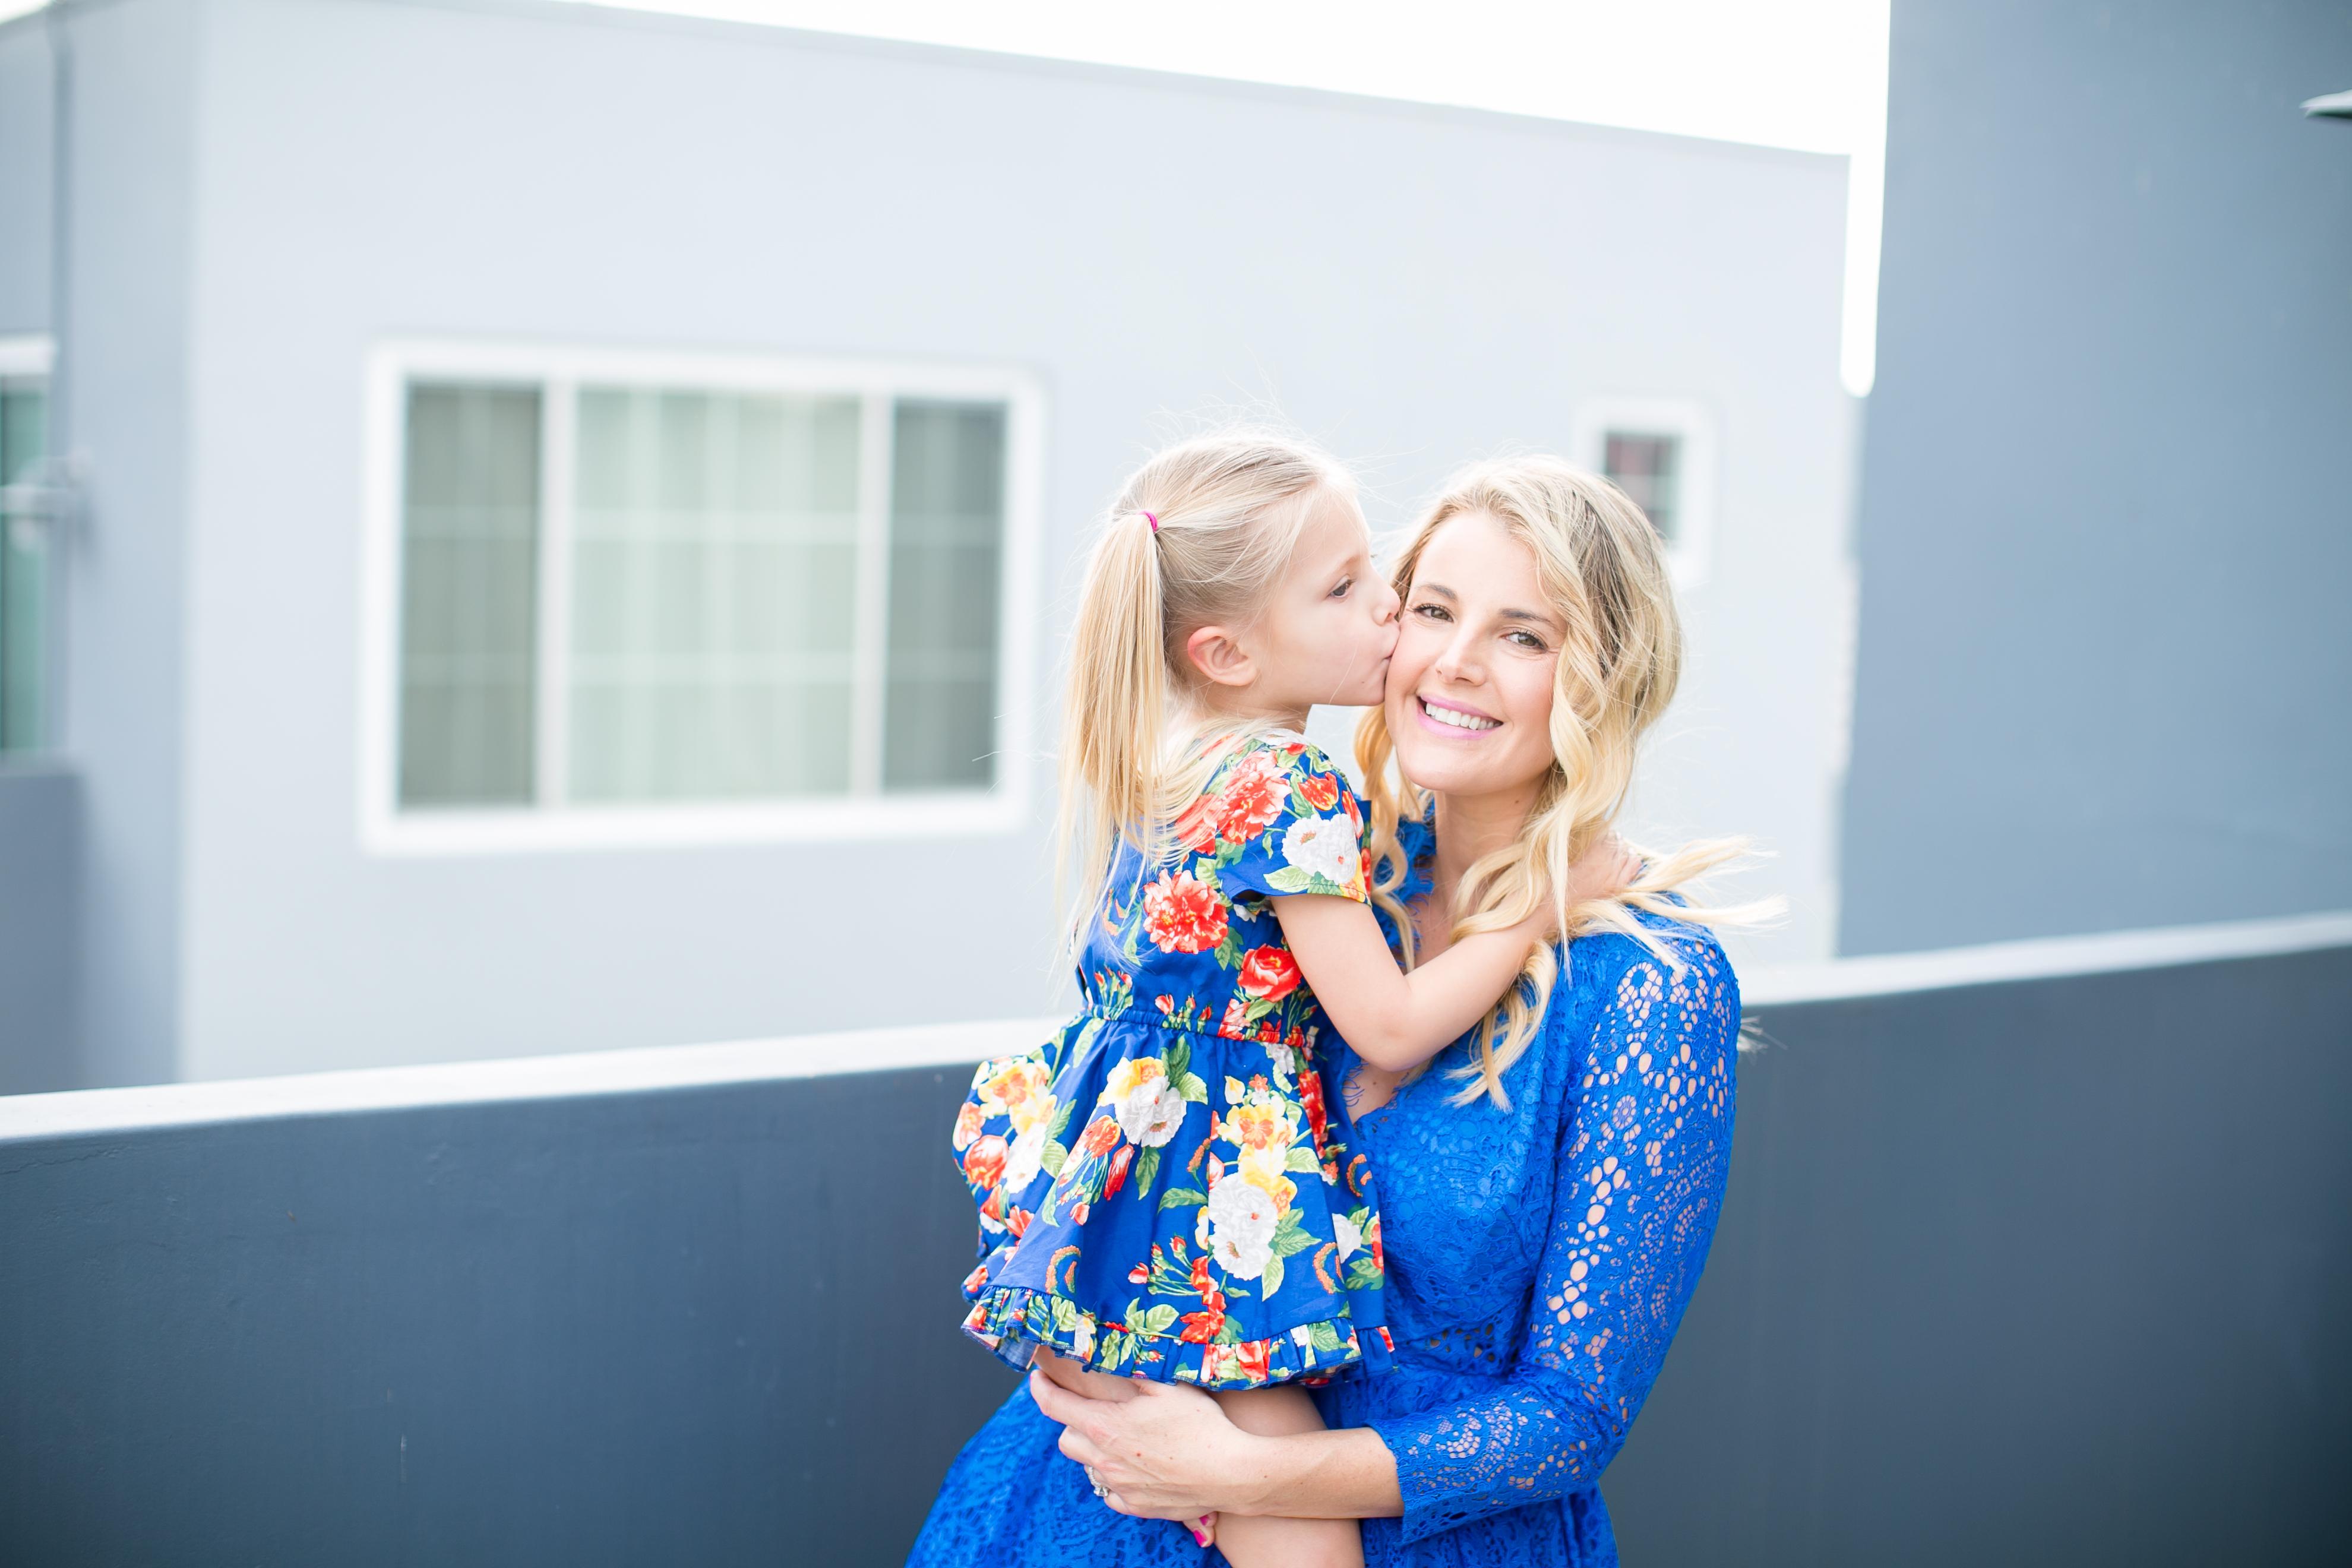 20 Things Every Working Mom Needs